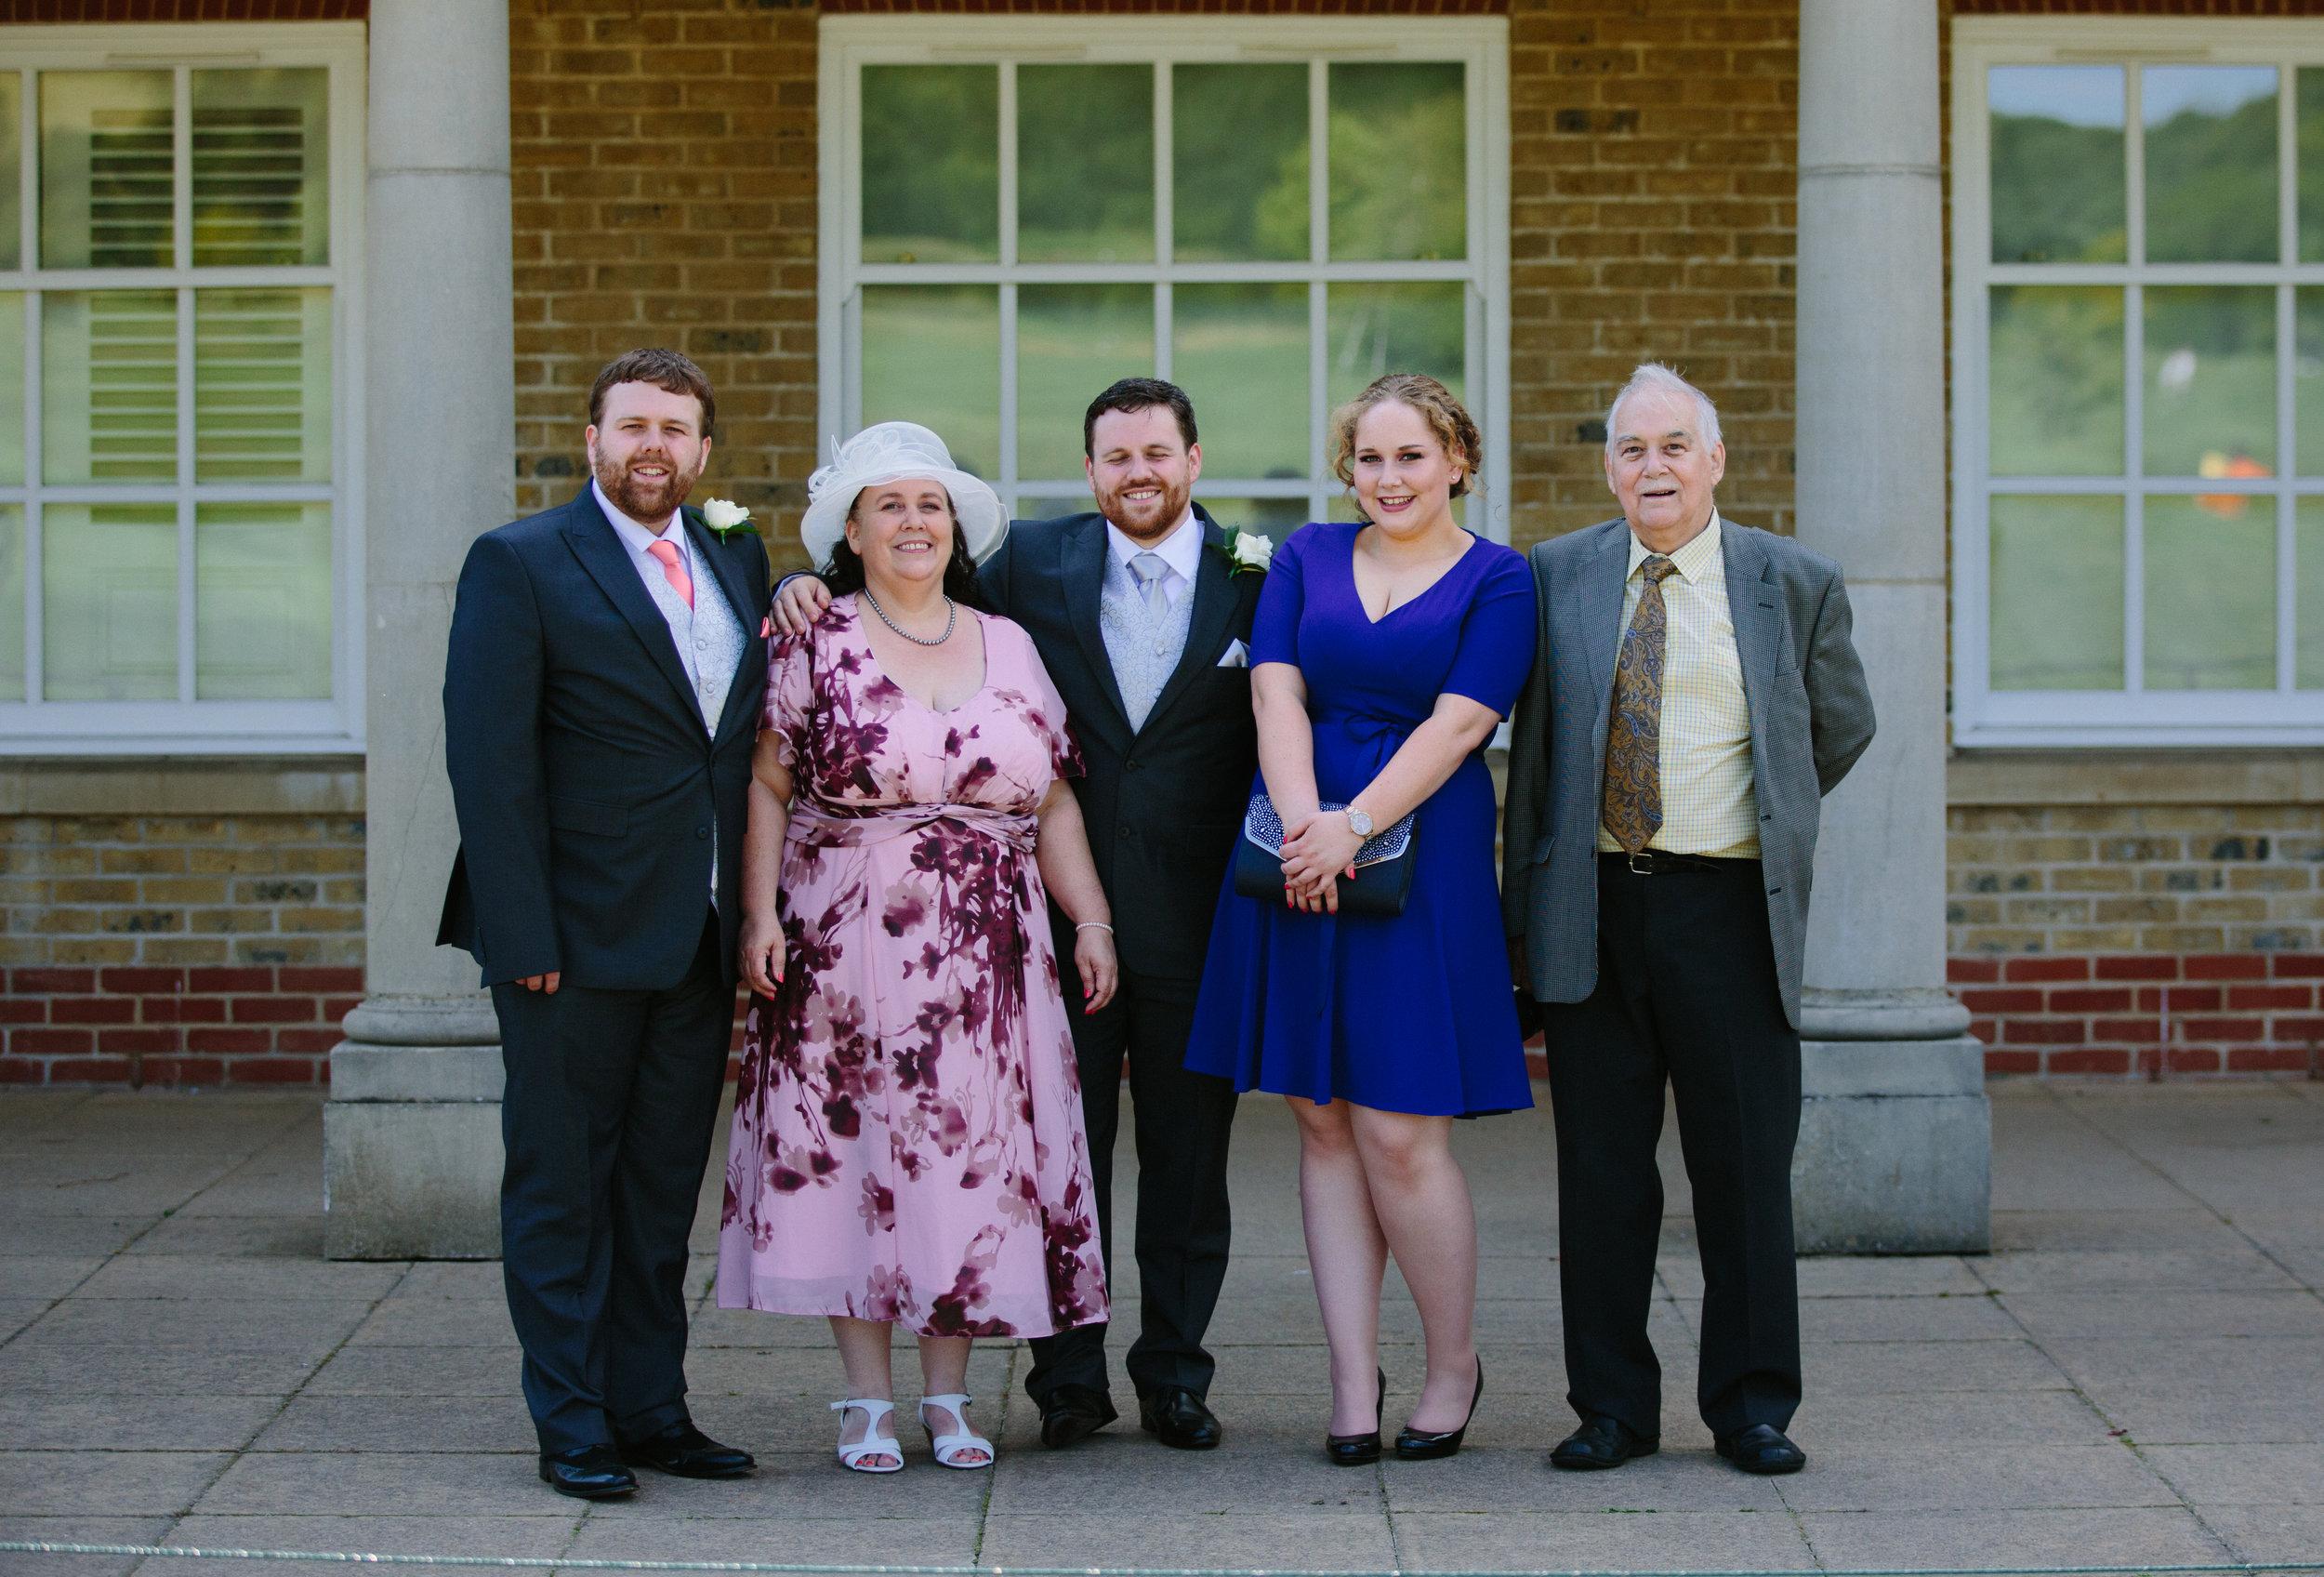 reigate-surrey-london-wedding-photography-group-formal-shot-72